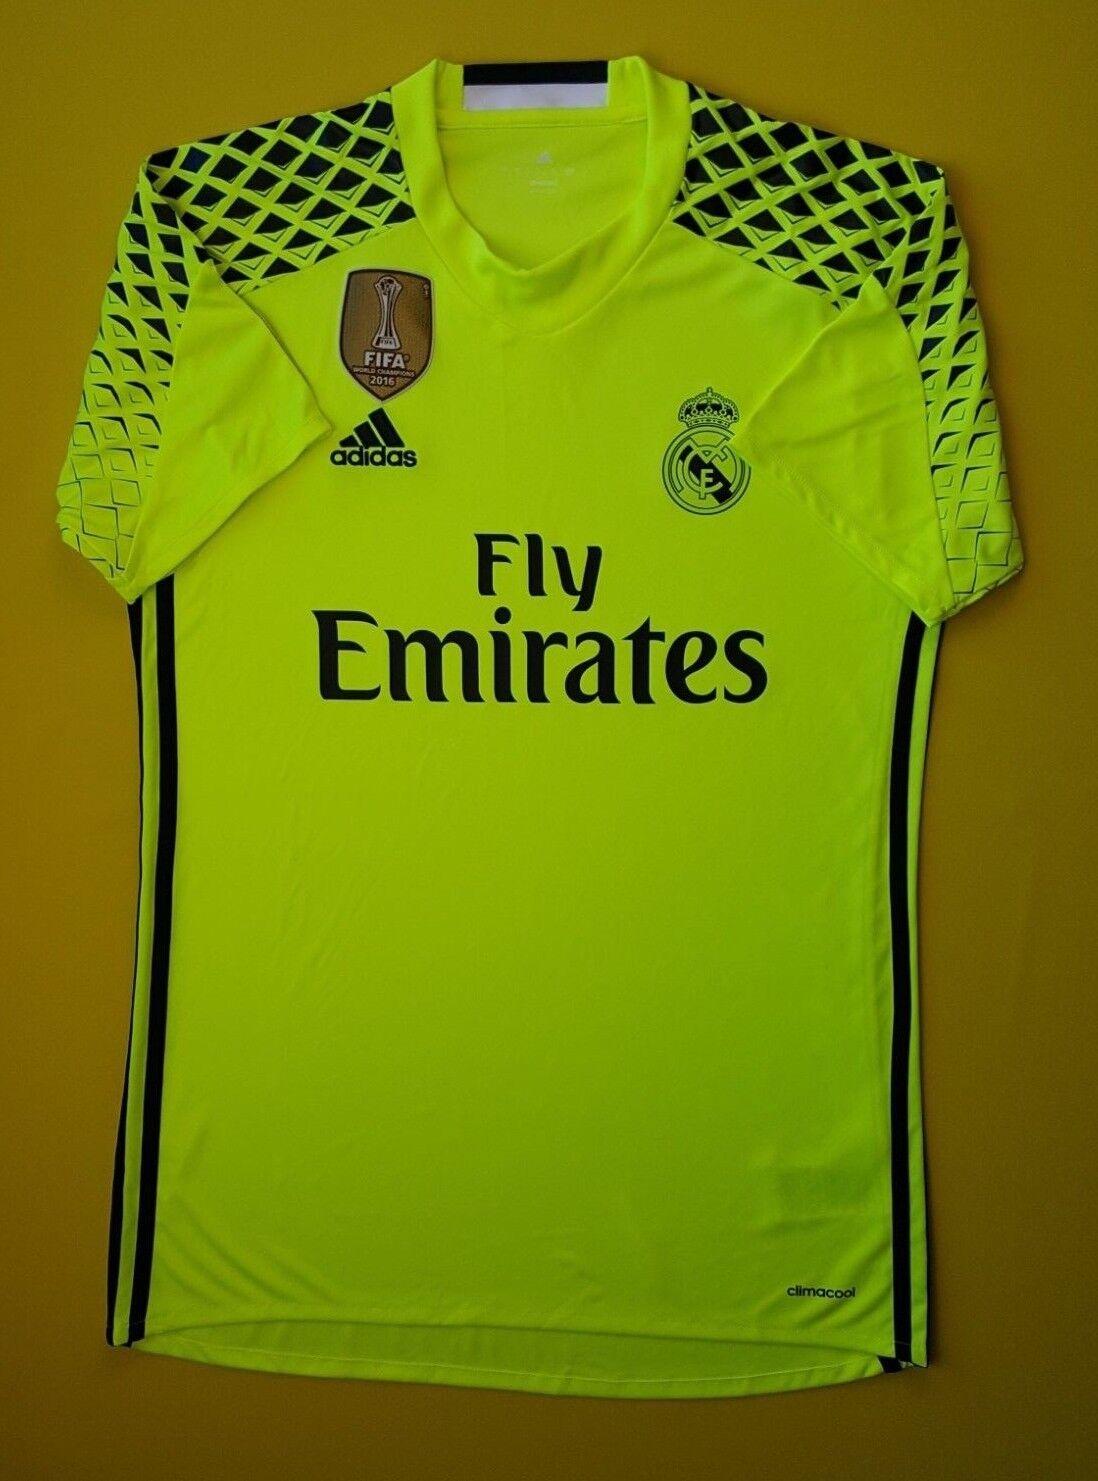 5+ 5 Real Madrid jersey SMALL 2016 2017 goalkeeper shirt B41453 soccer Adidas